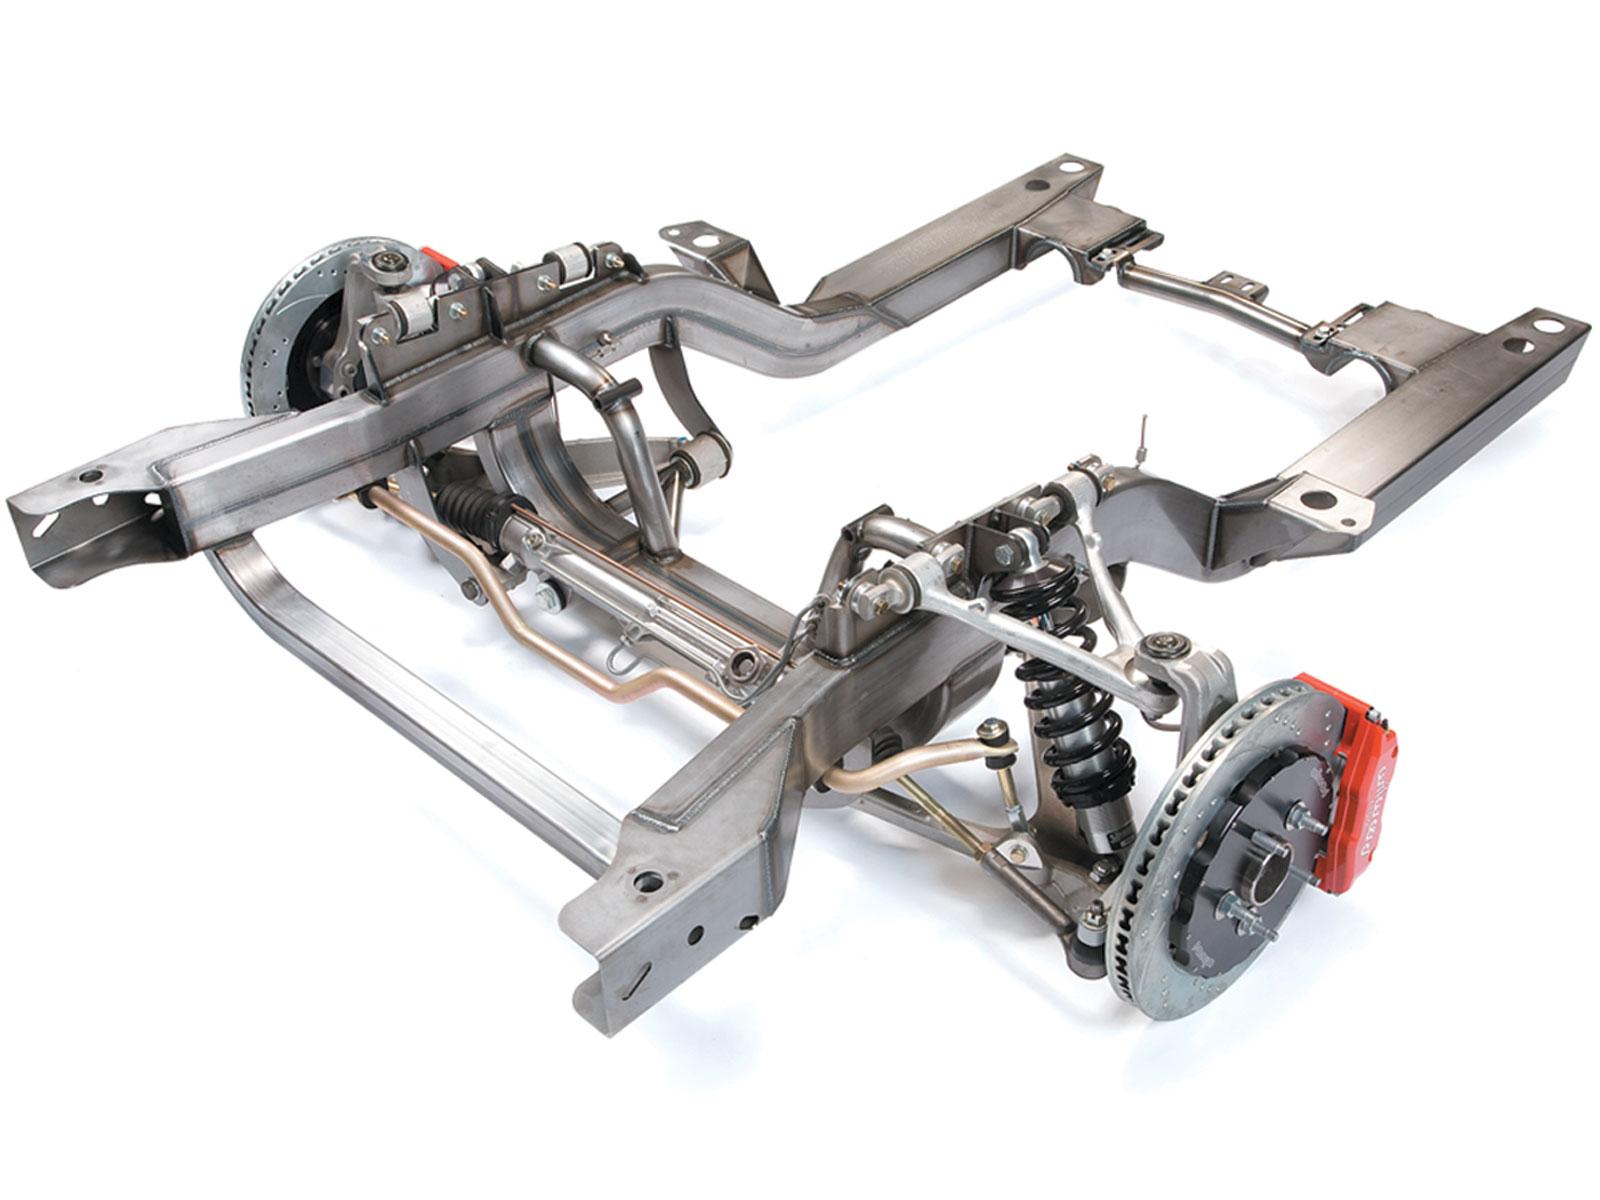 Chevrolet Cobalt Suspension Diagram Trusted Schematics 2009 Chevy Lt Engine Front